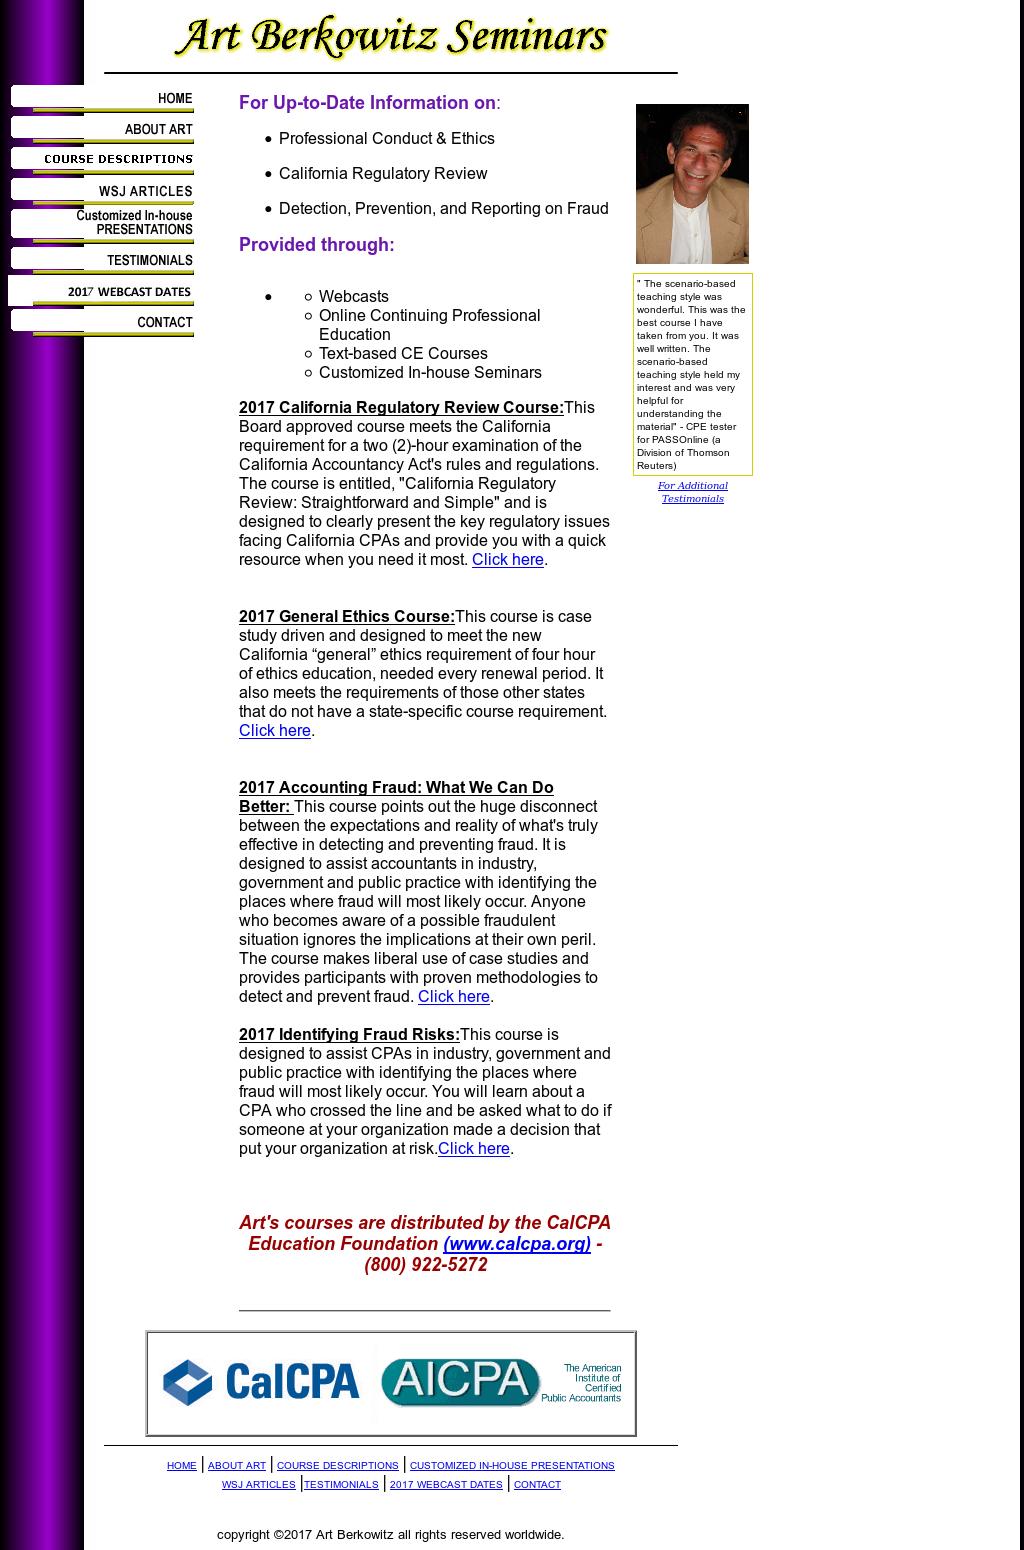 Art Berkowitz Competitors, Revenue and Employees - Owler